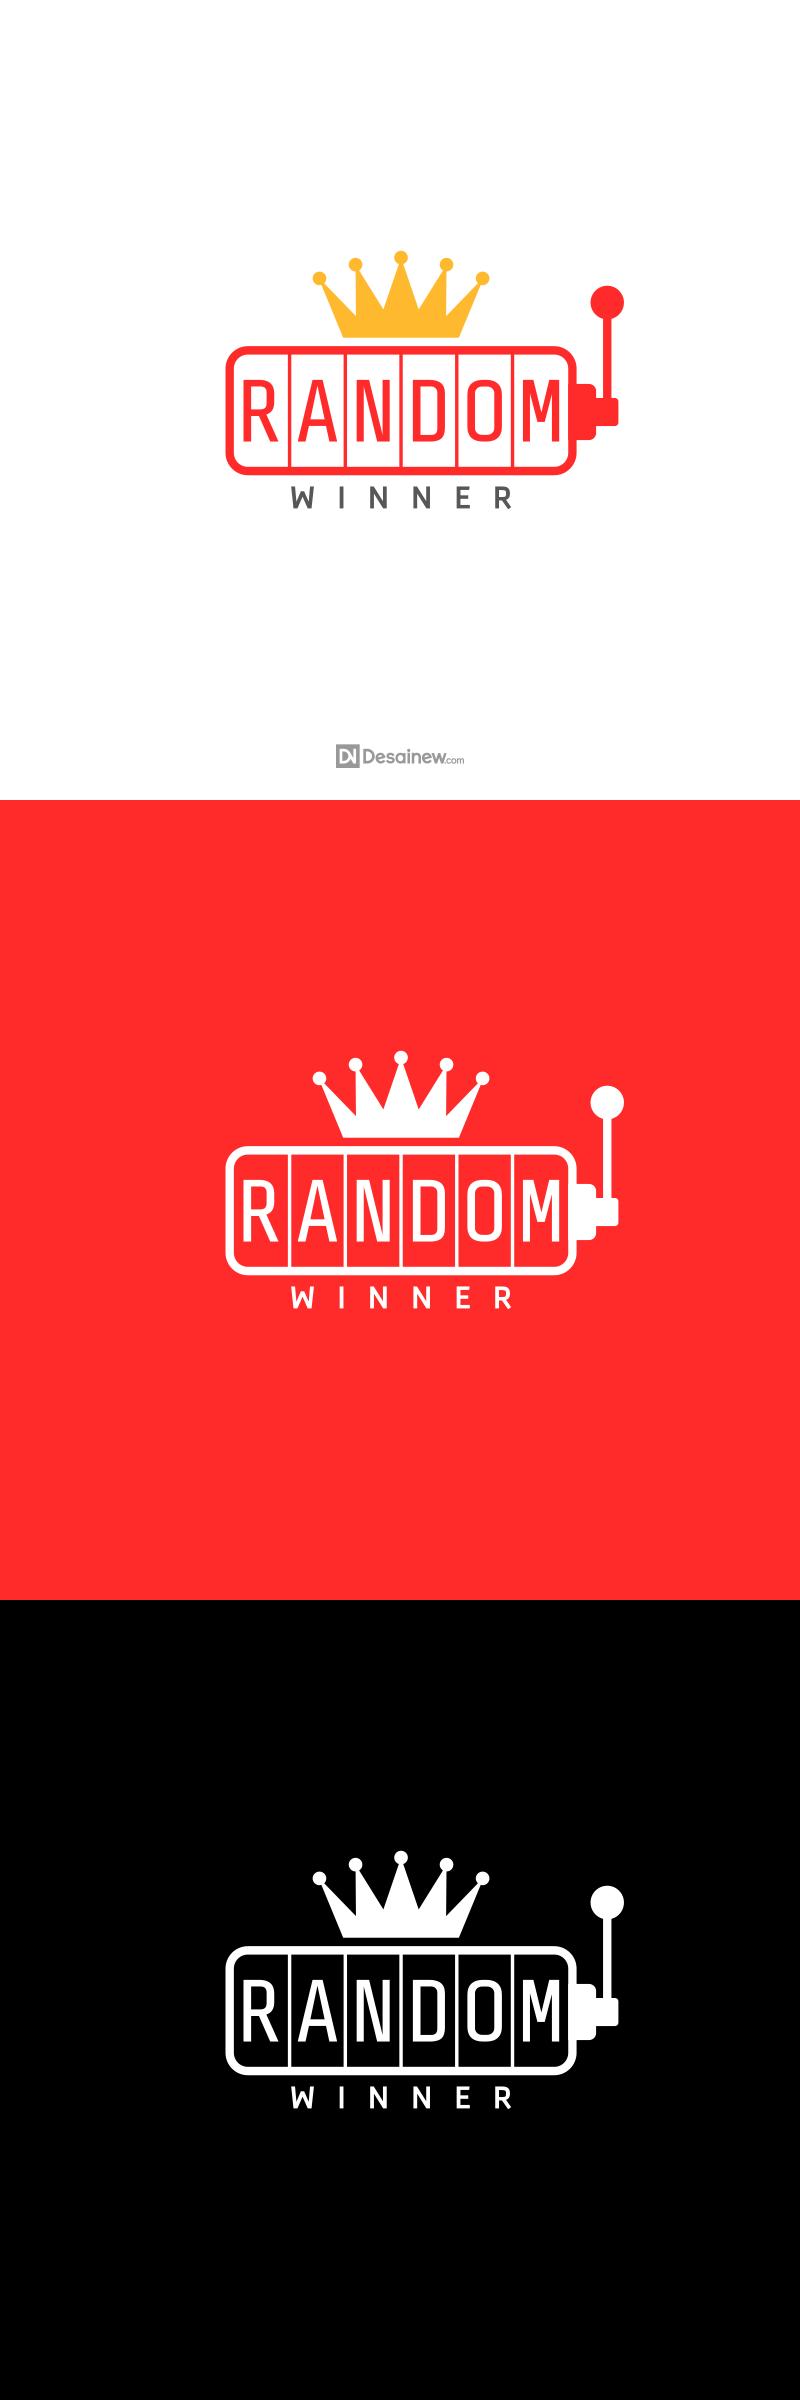 Random Winner Logo Design Project Portfolio Desainew Studio